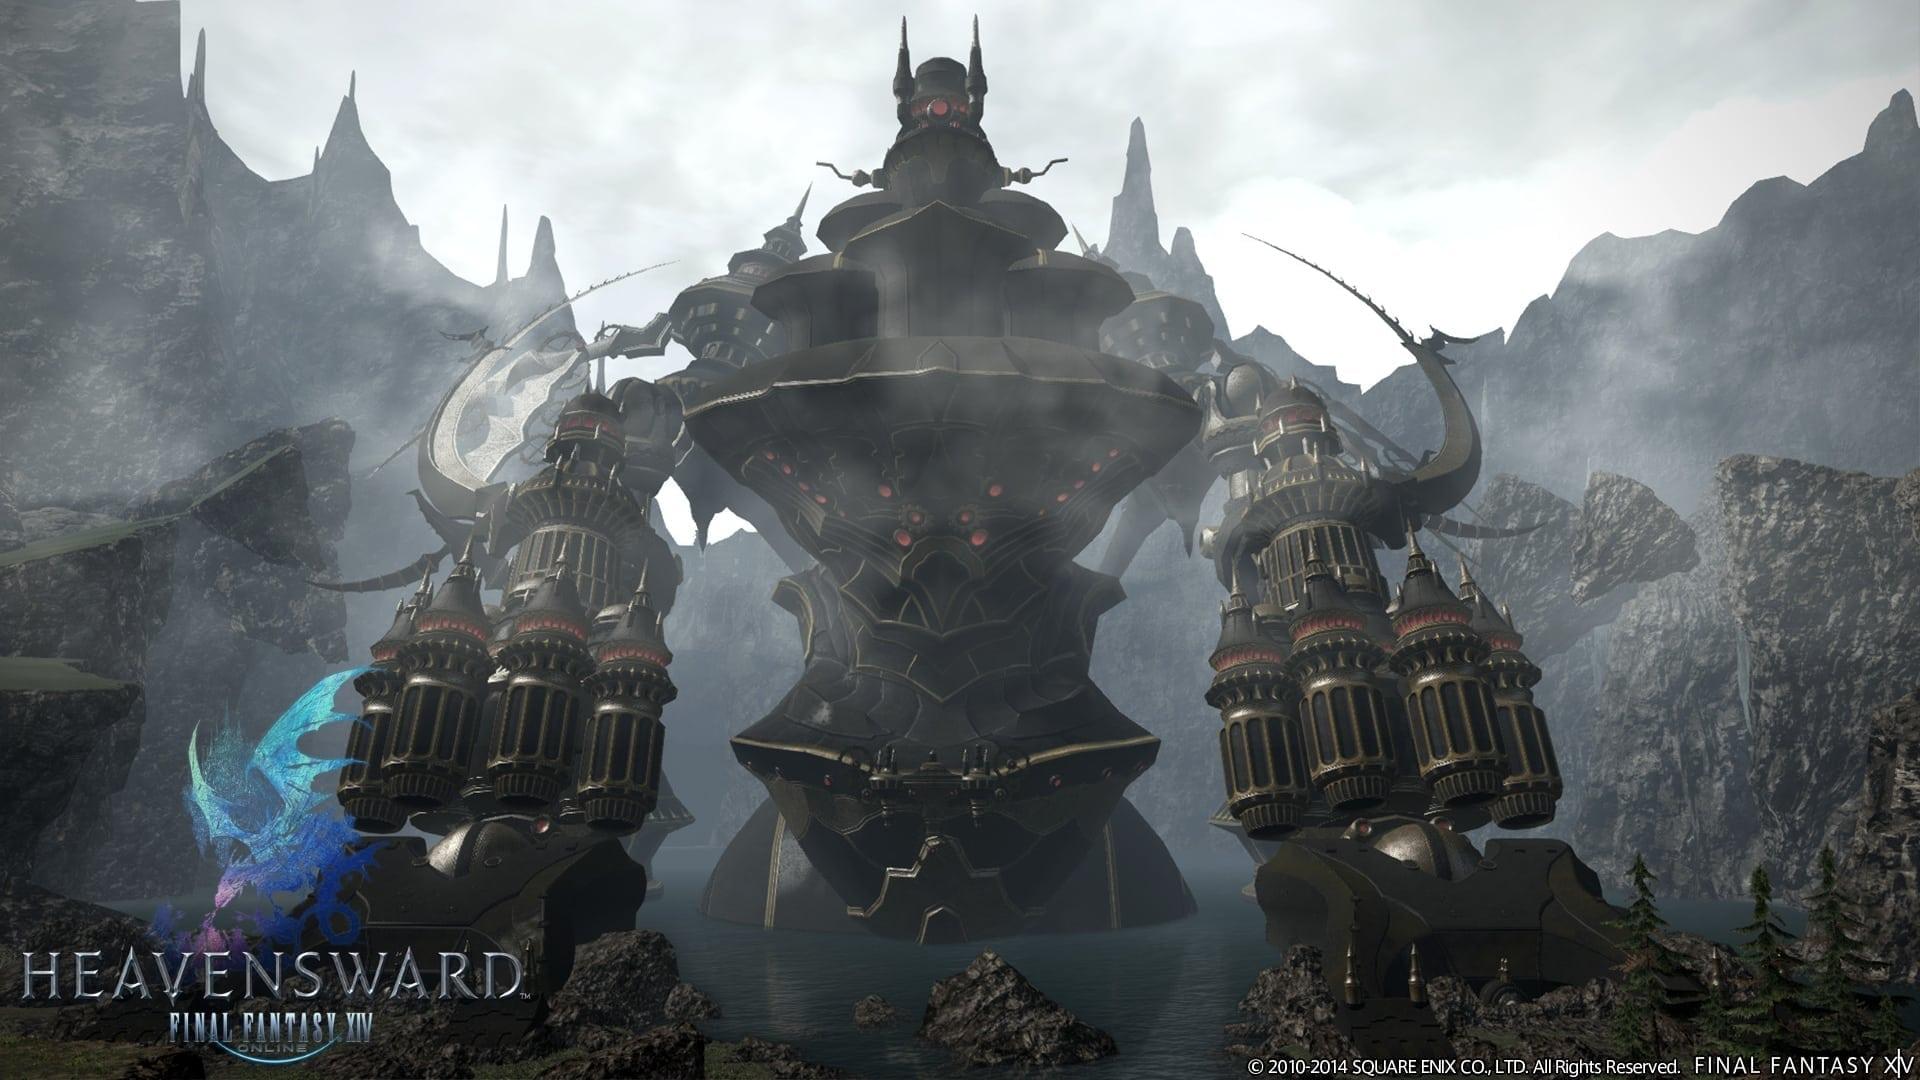 Final Fantasy XIV Heavensward - Alexander raid dungeon image 3